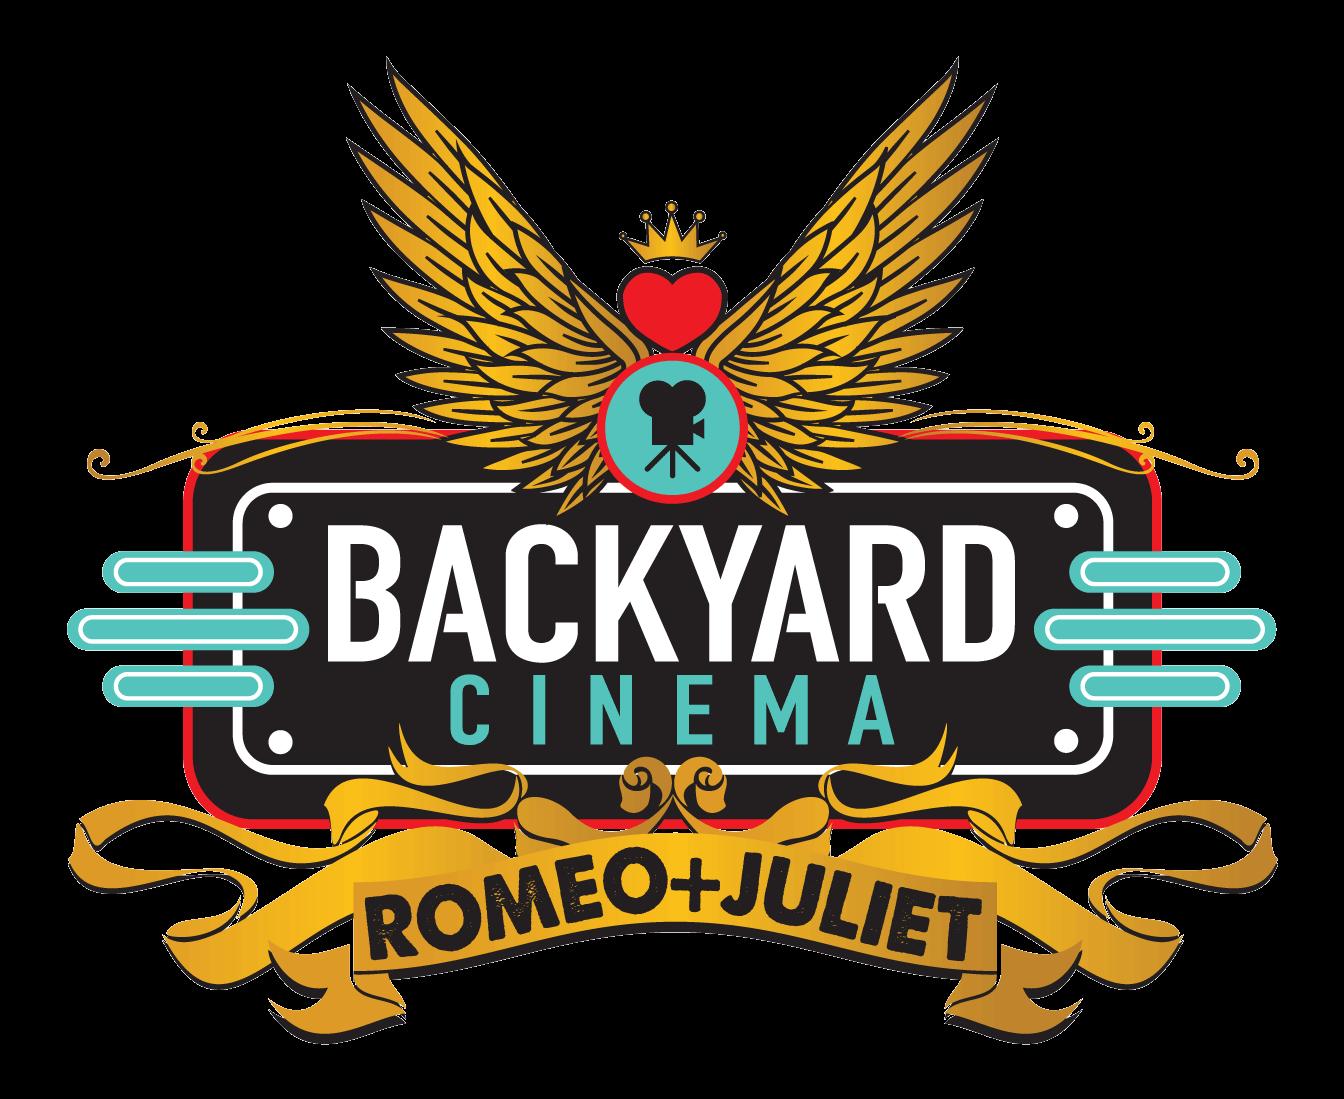 Romeo & Juliet logo